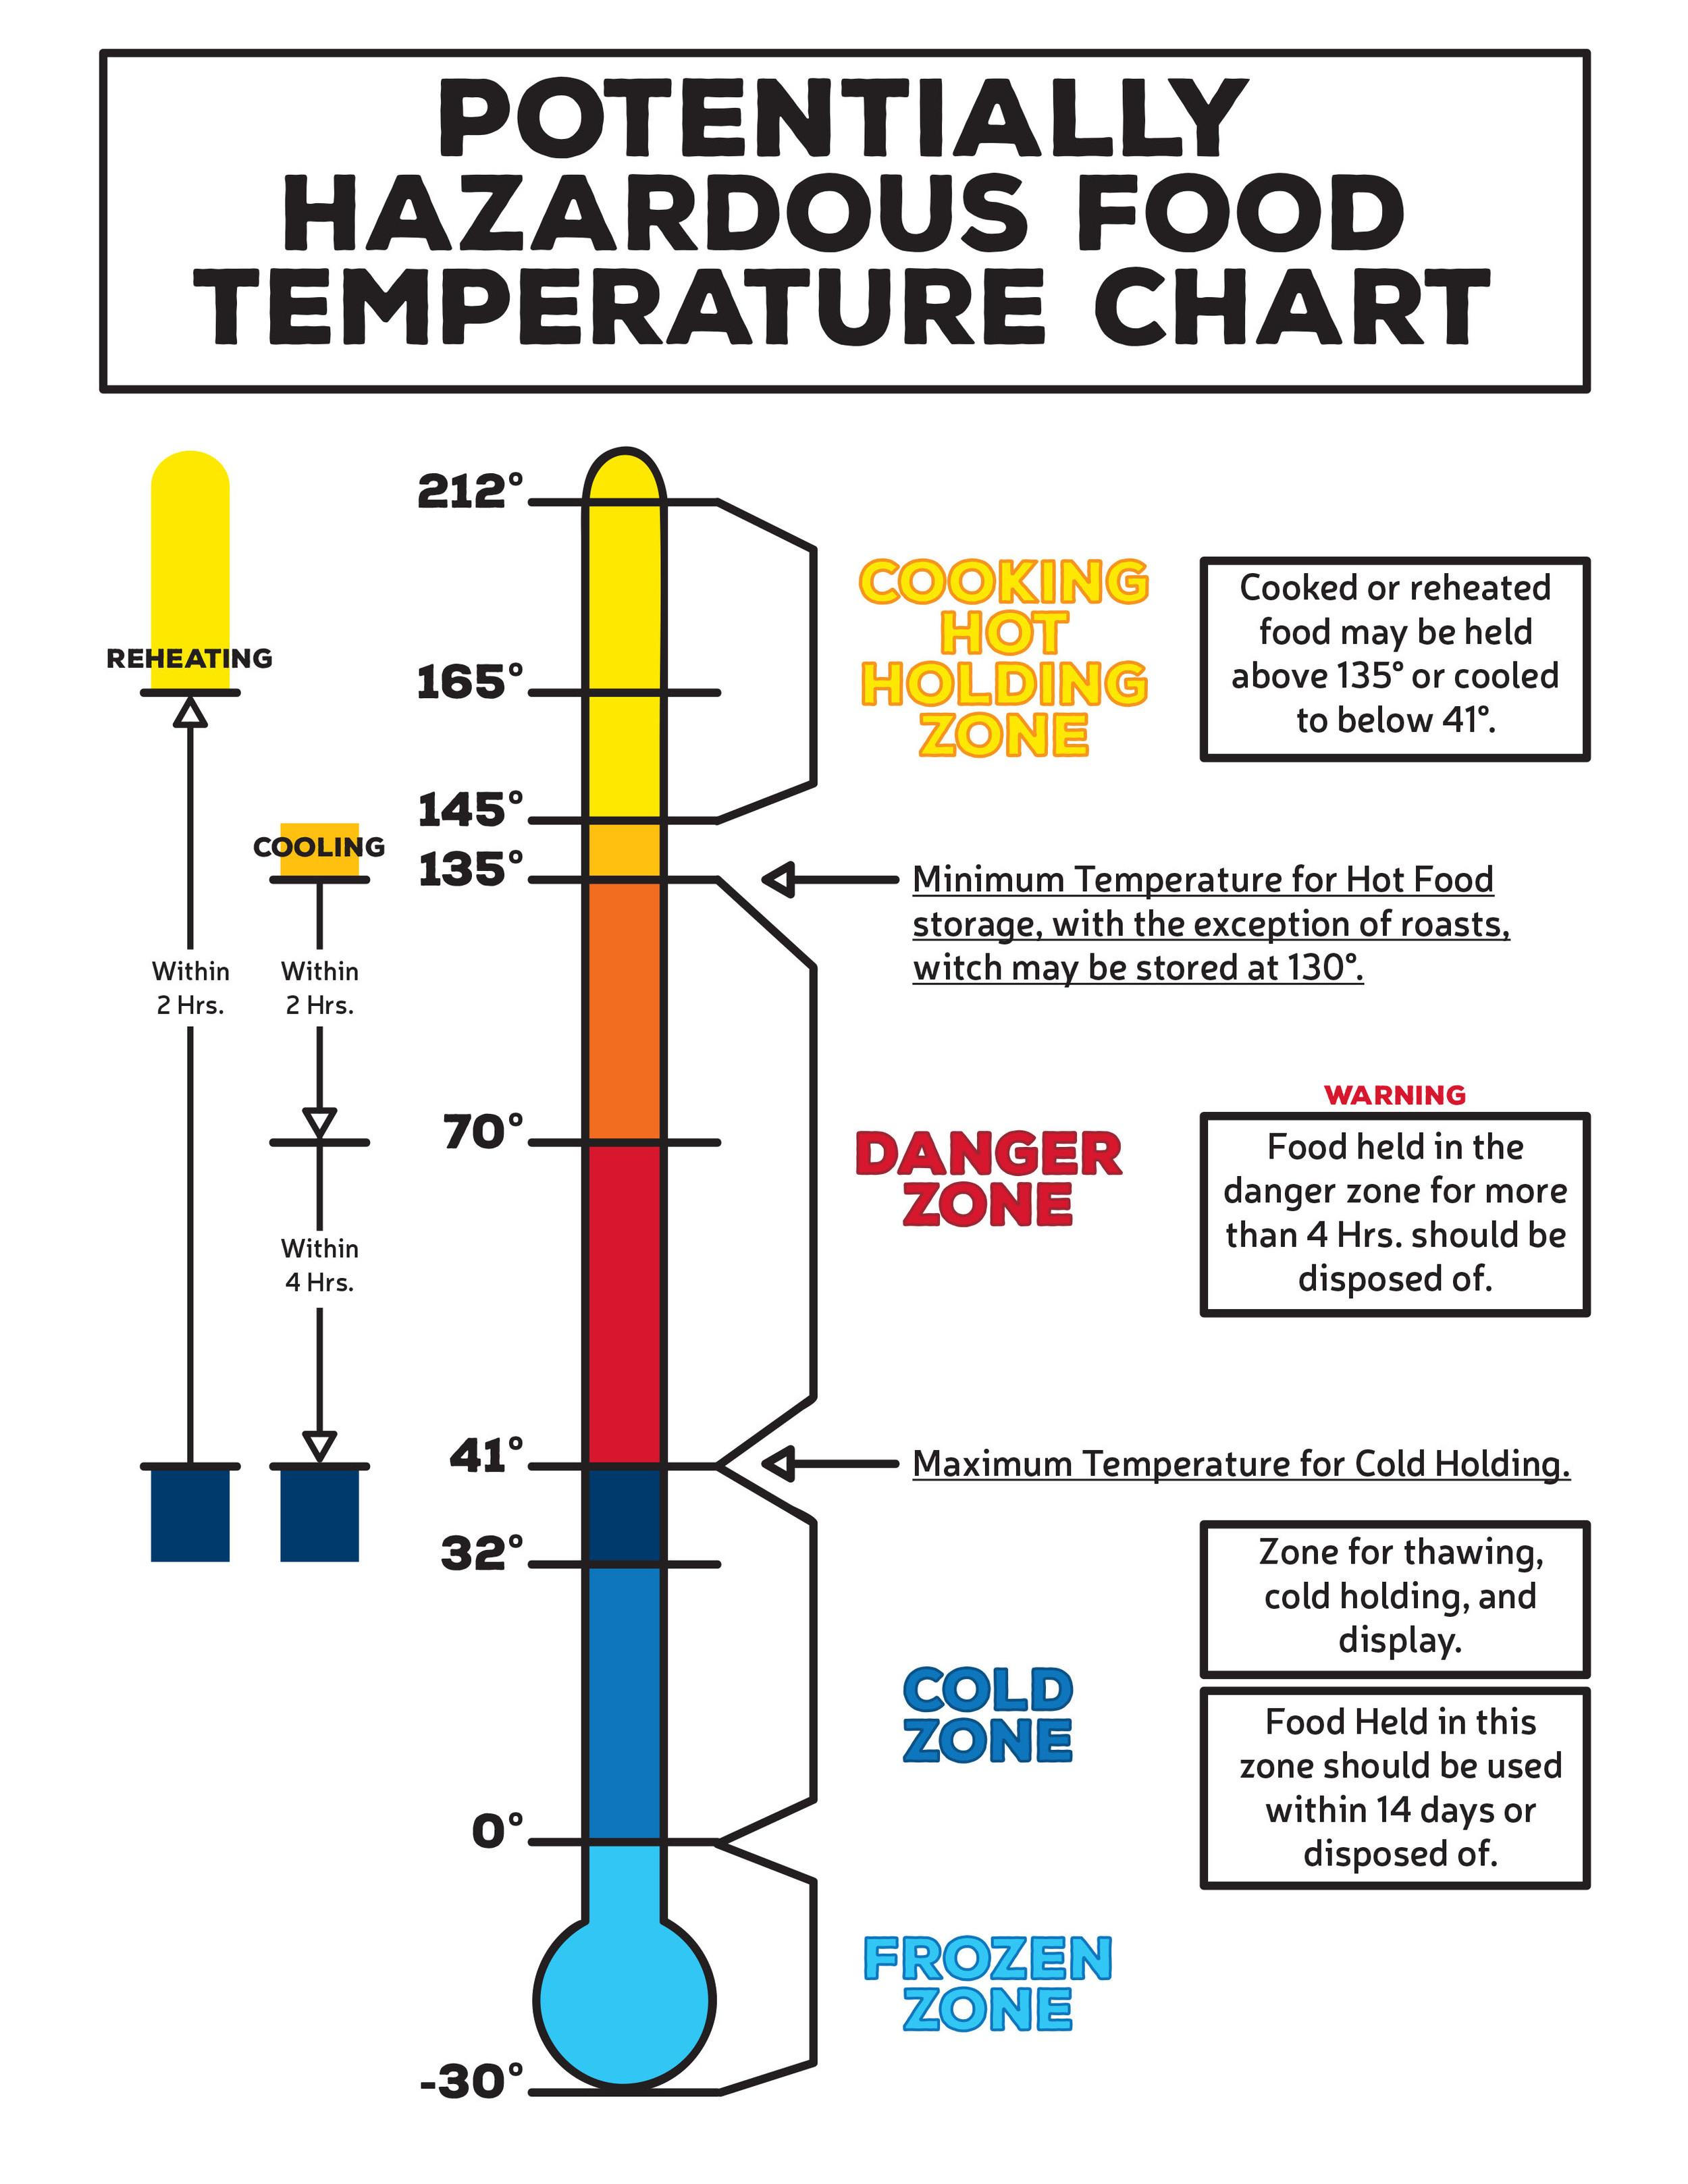 Potentially Hazardous Food Chart.jpg